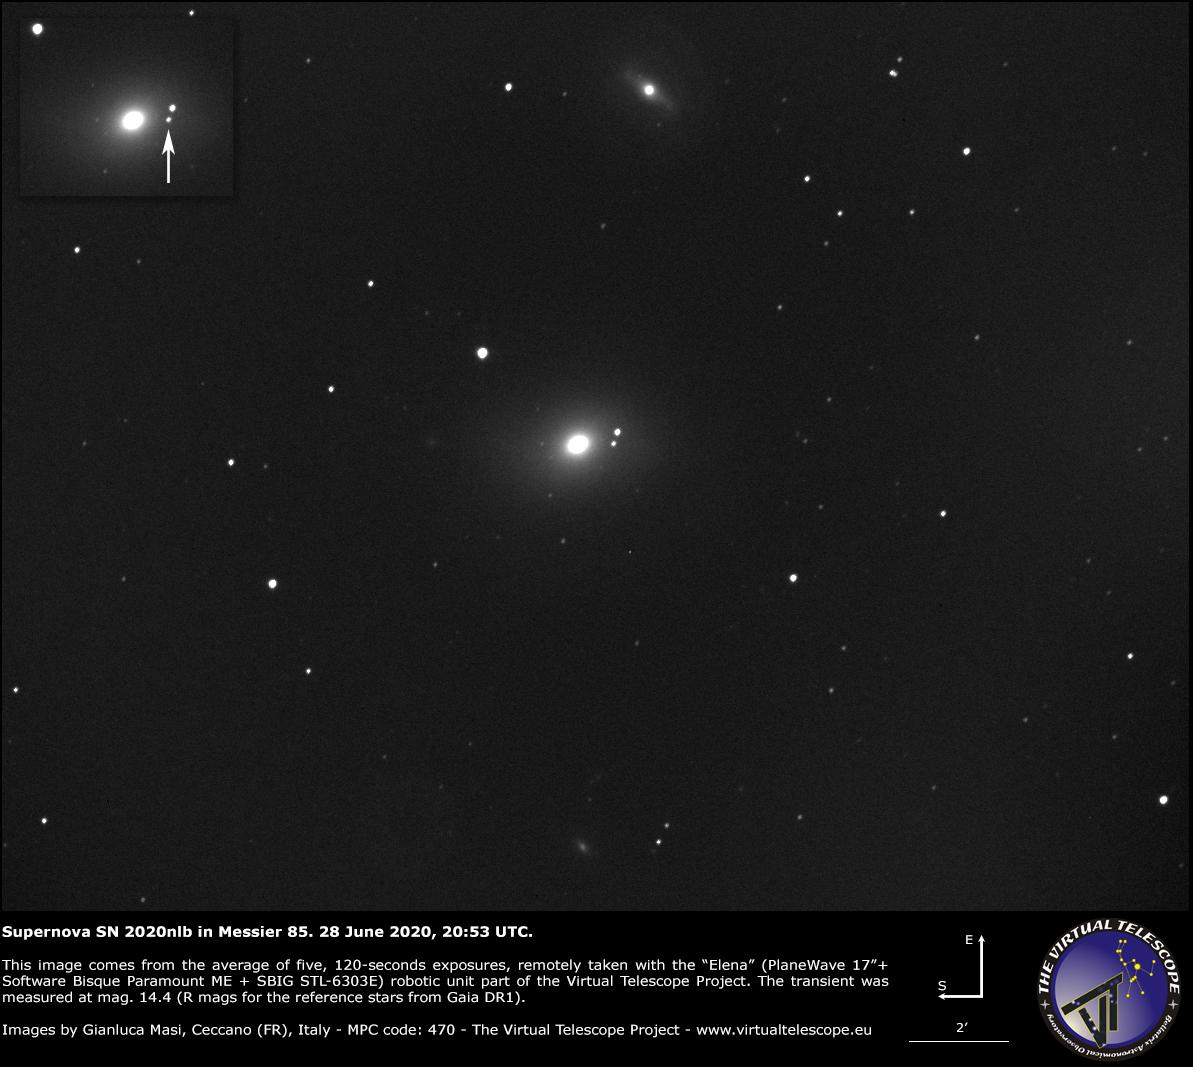 Supernova SN 2020nlb in Messier 85: an image - 28 June 2020